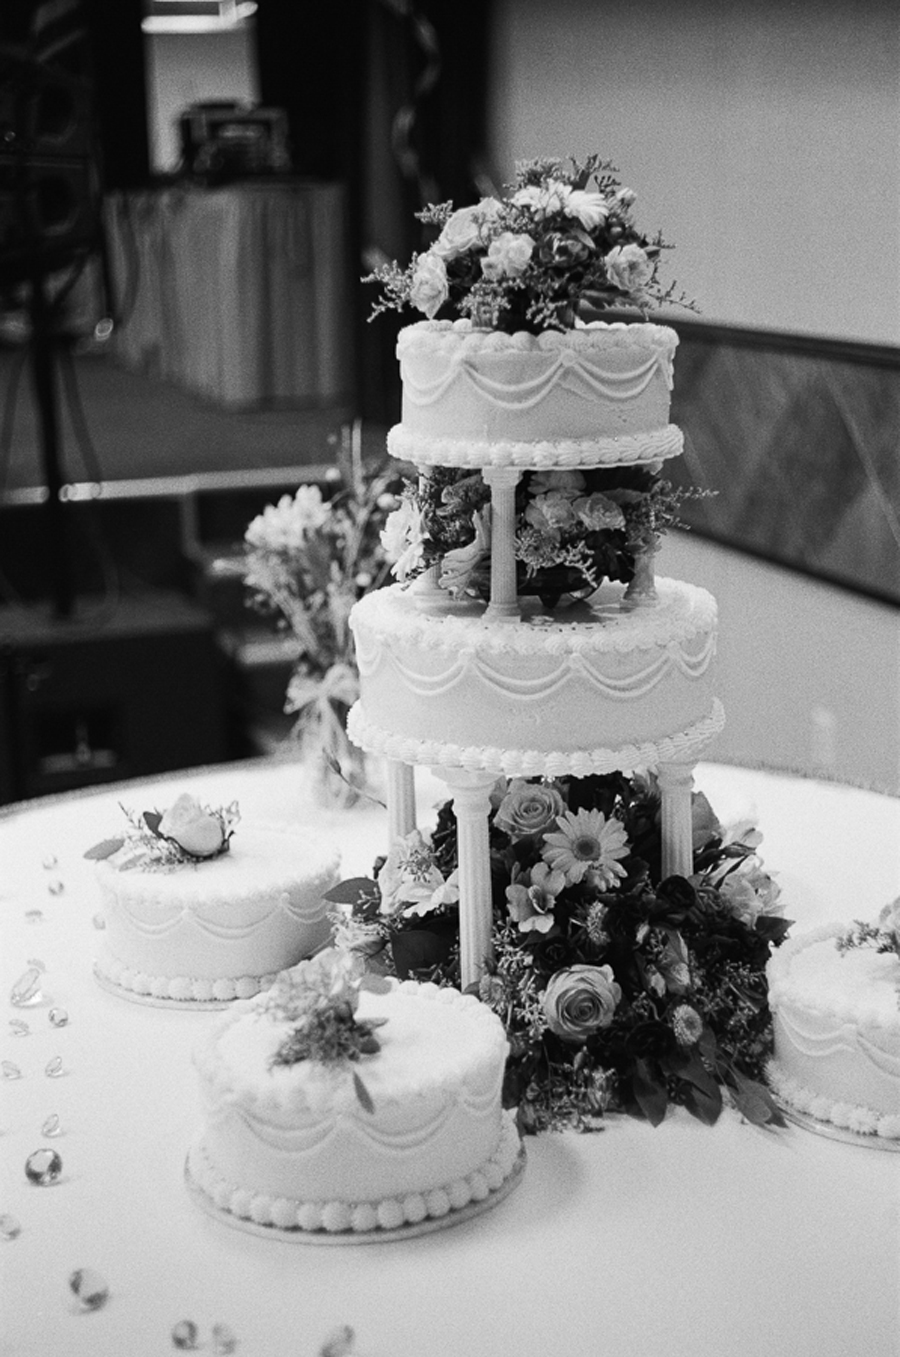 KyleSFord_WeddingPhotographer_Seattle_029